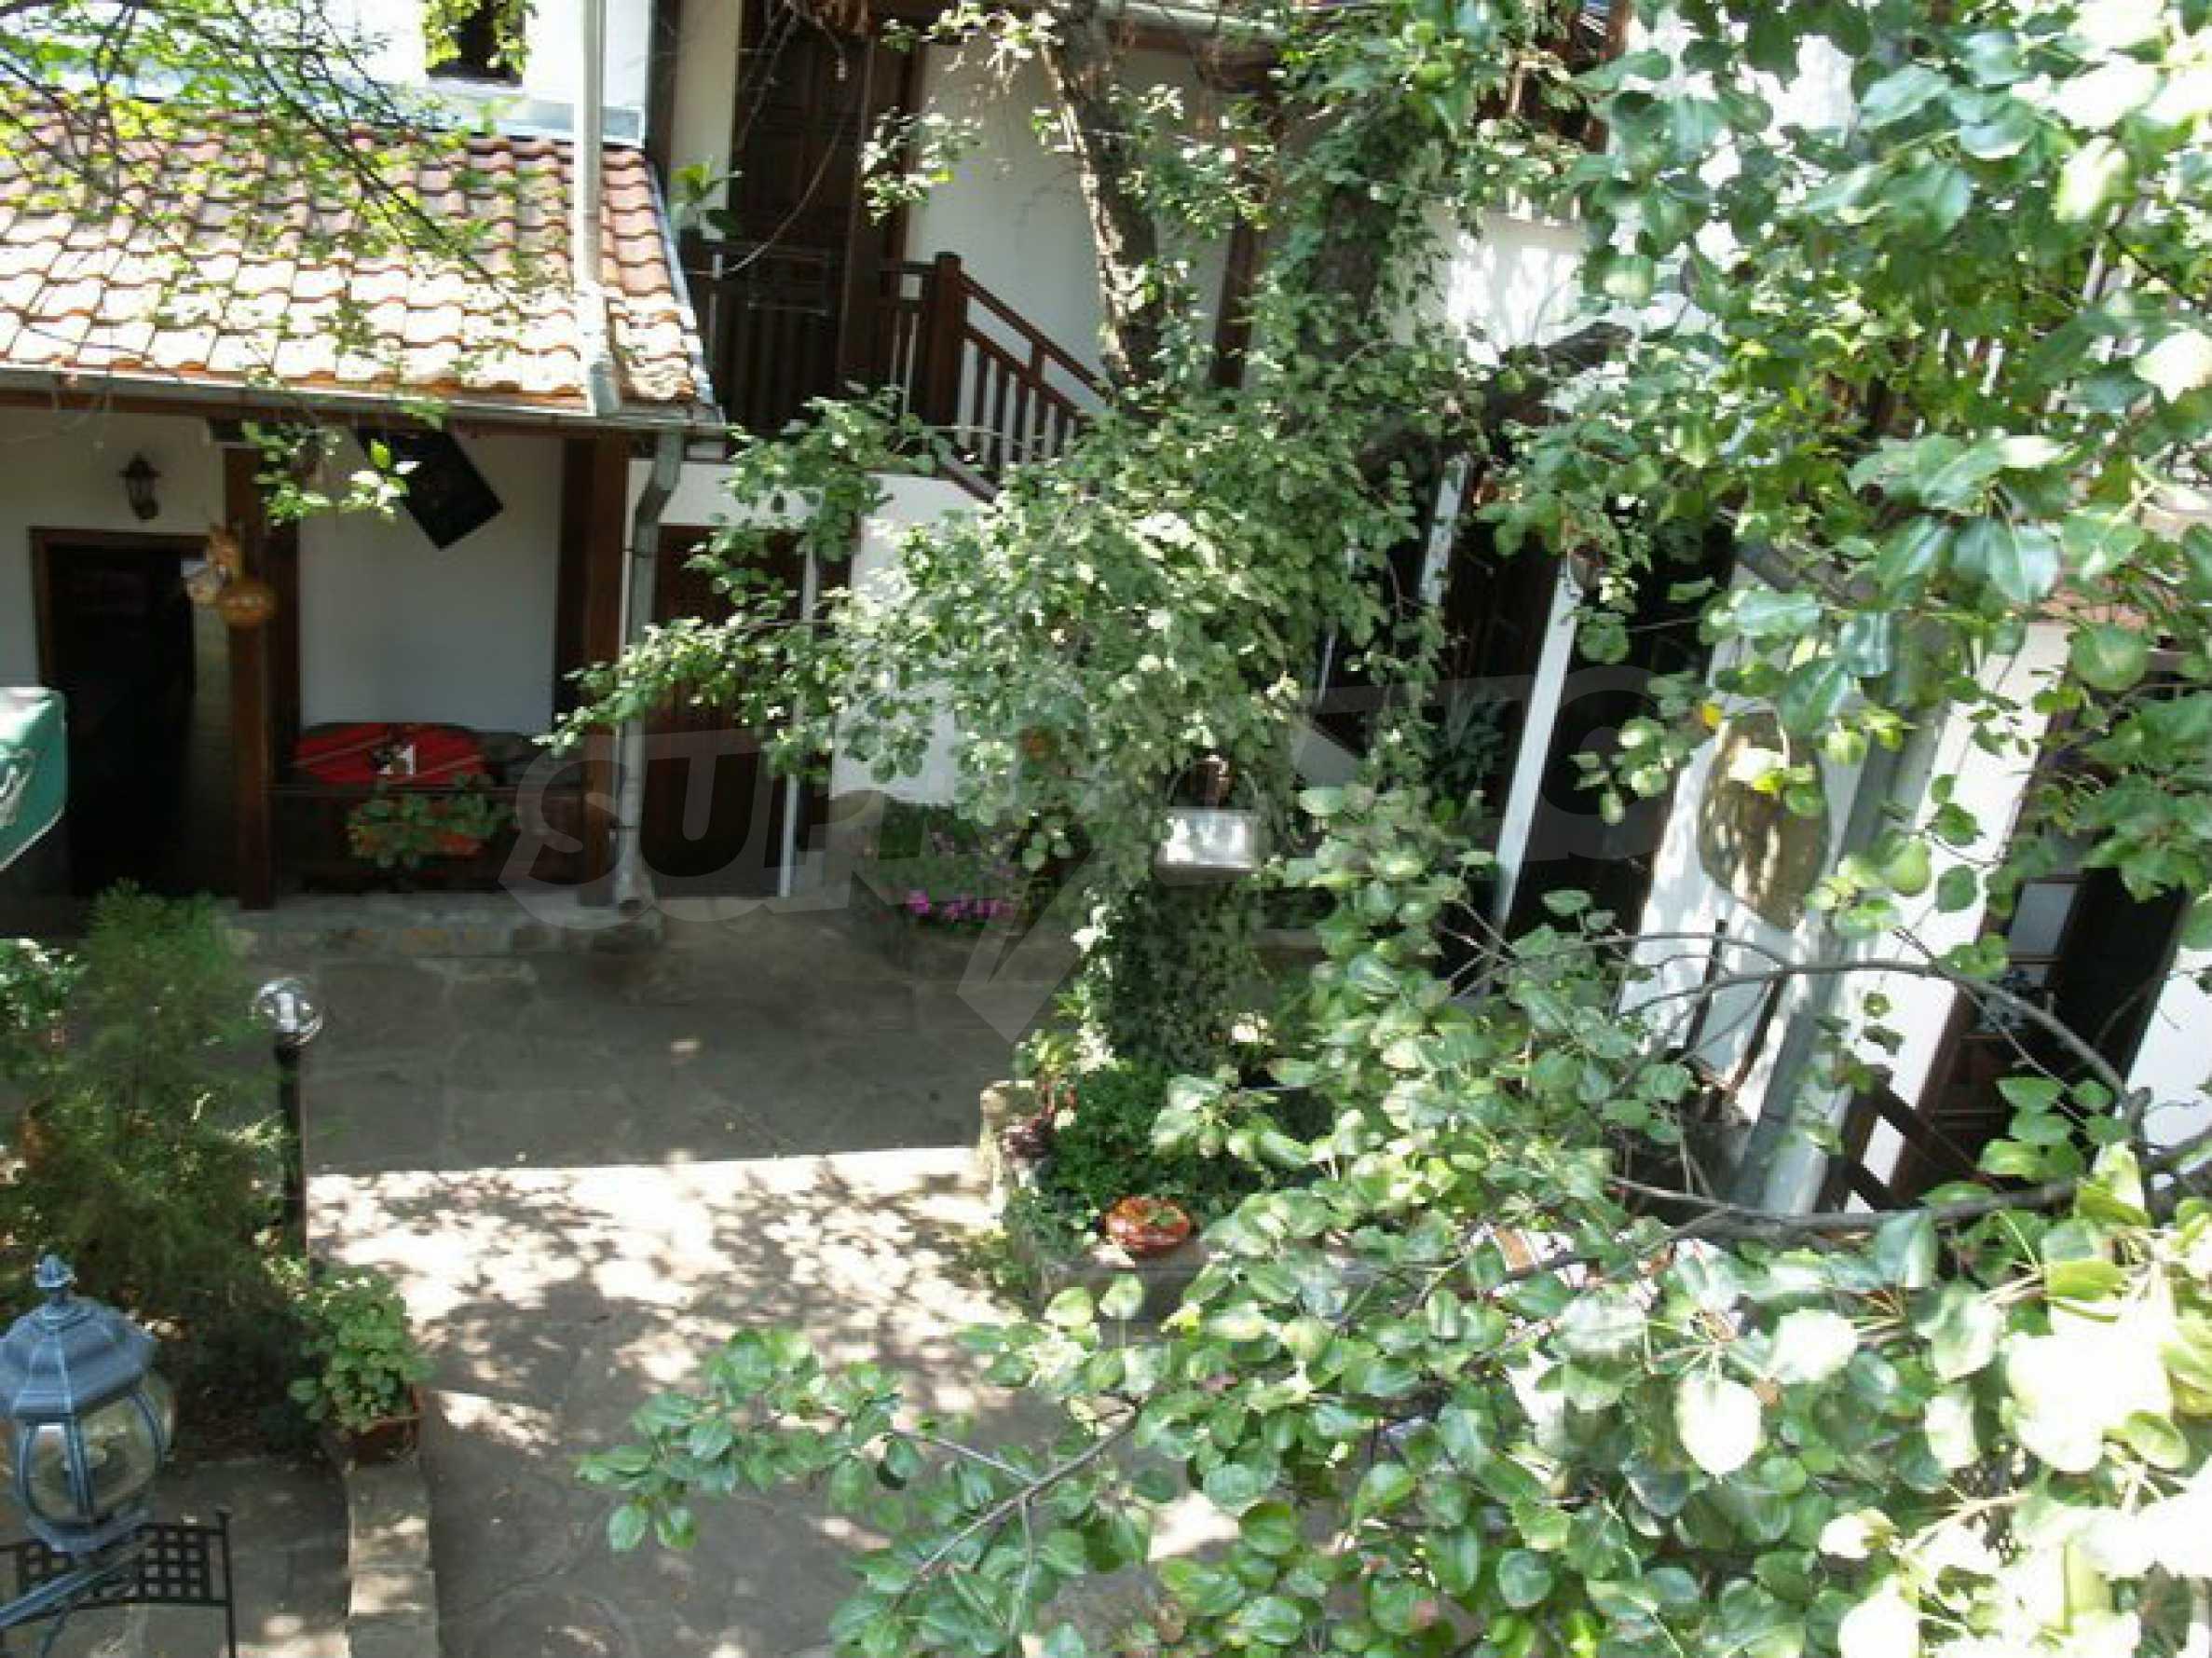 Hotelanlage mit Restaurant am Ufer des Flusses Osam in Lovech 15